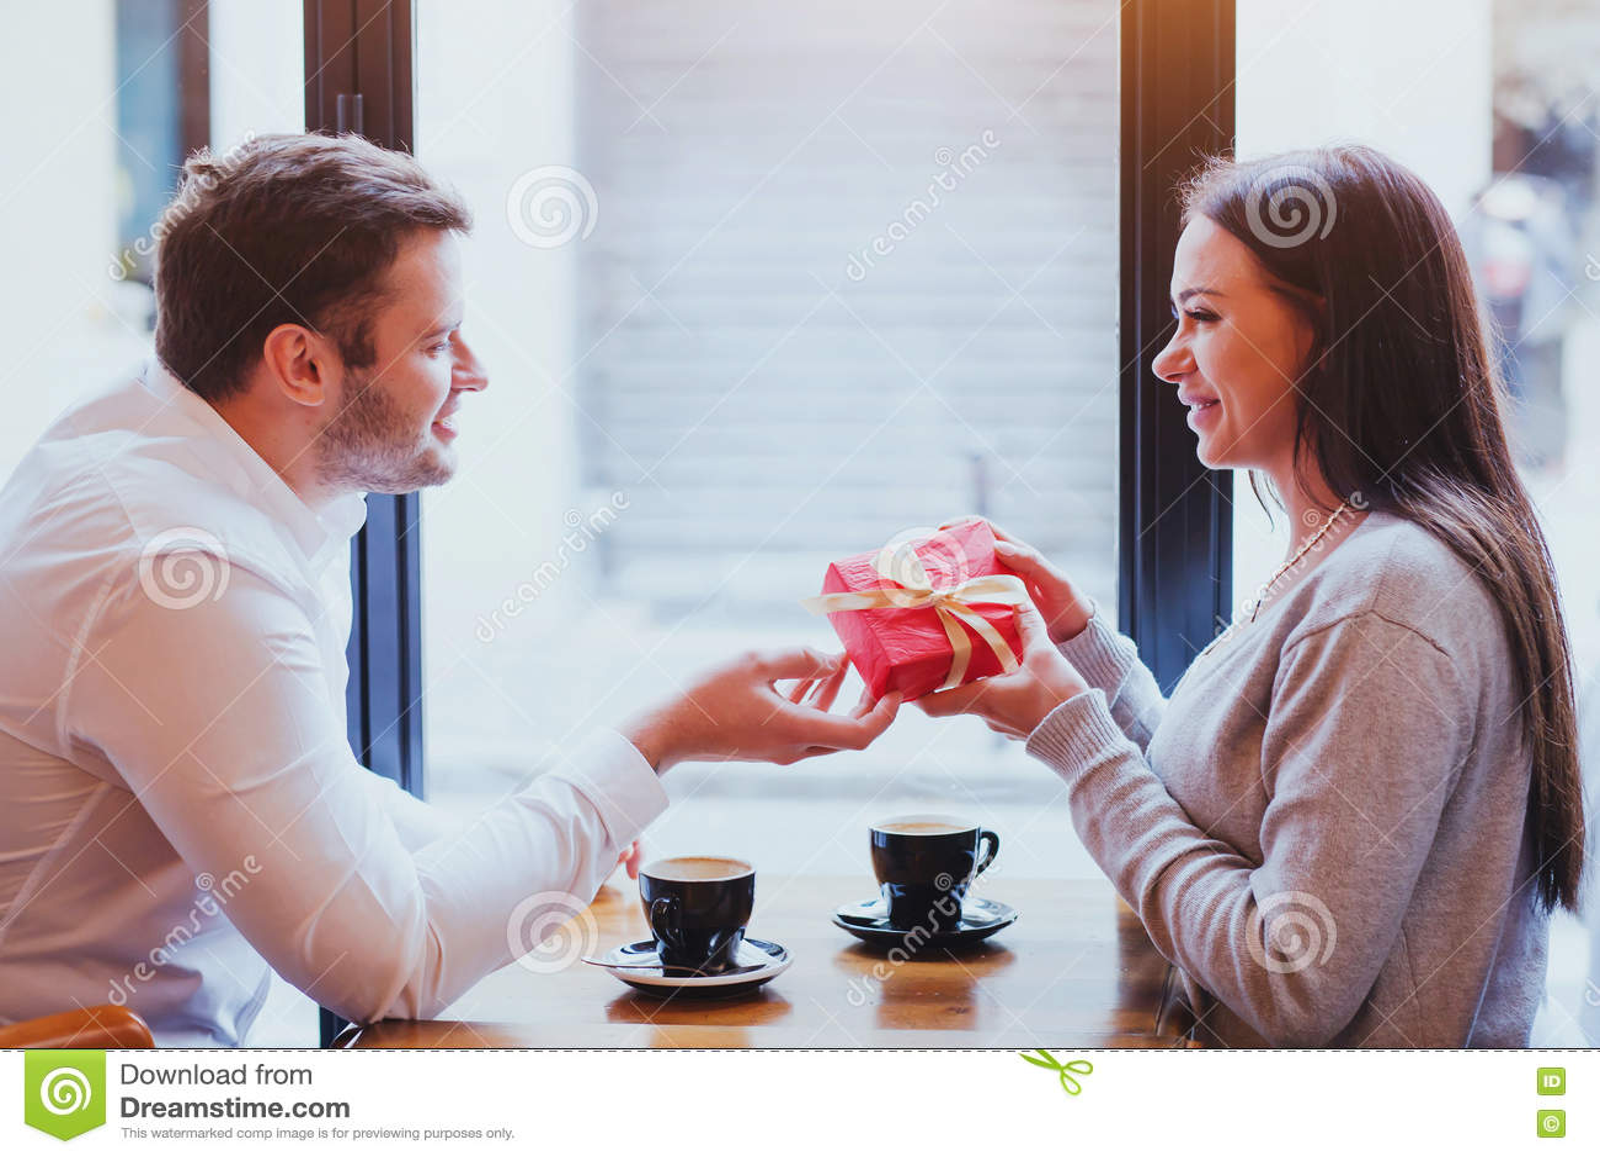 photo anniversaire couple